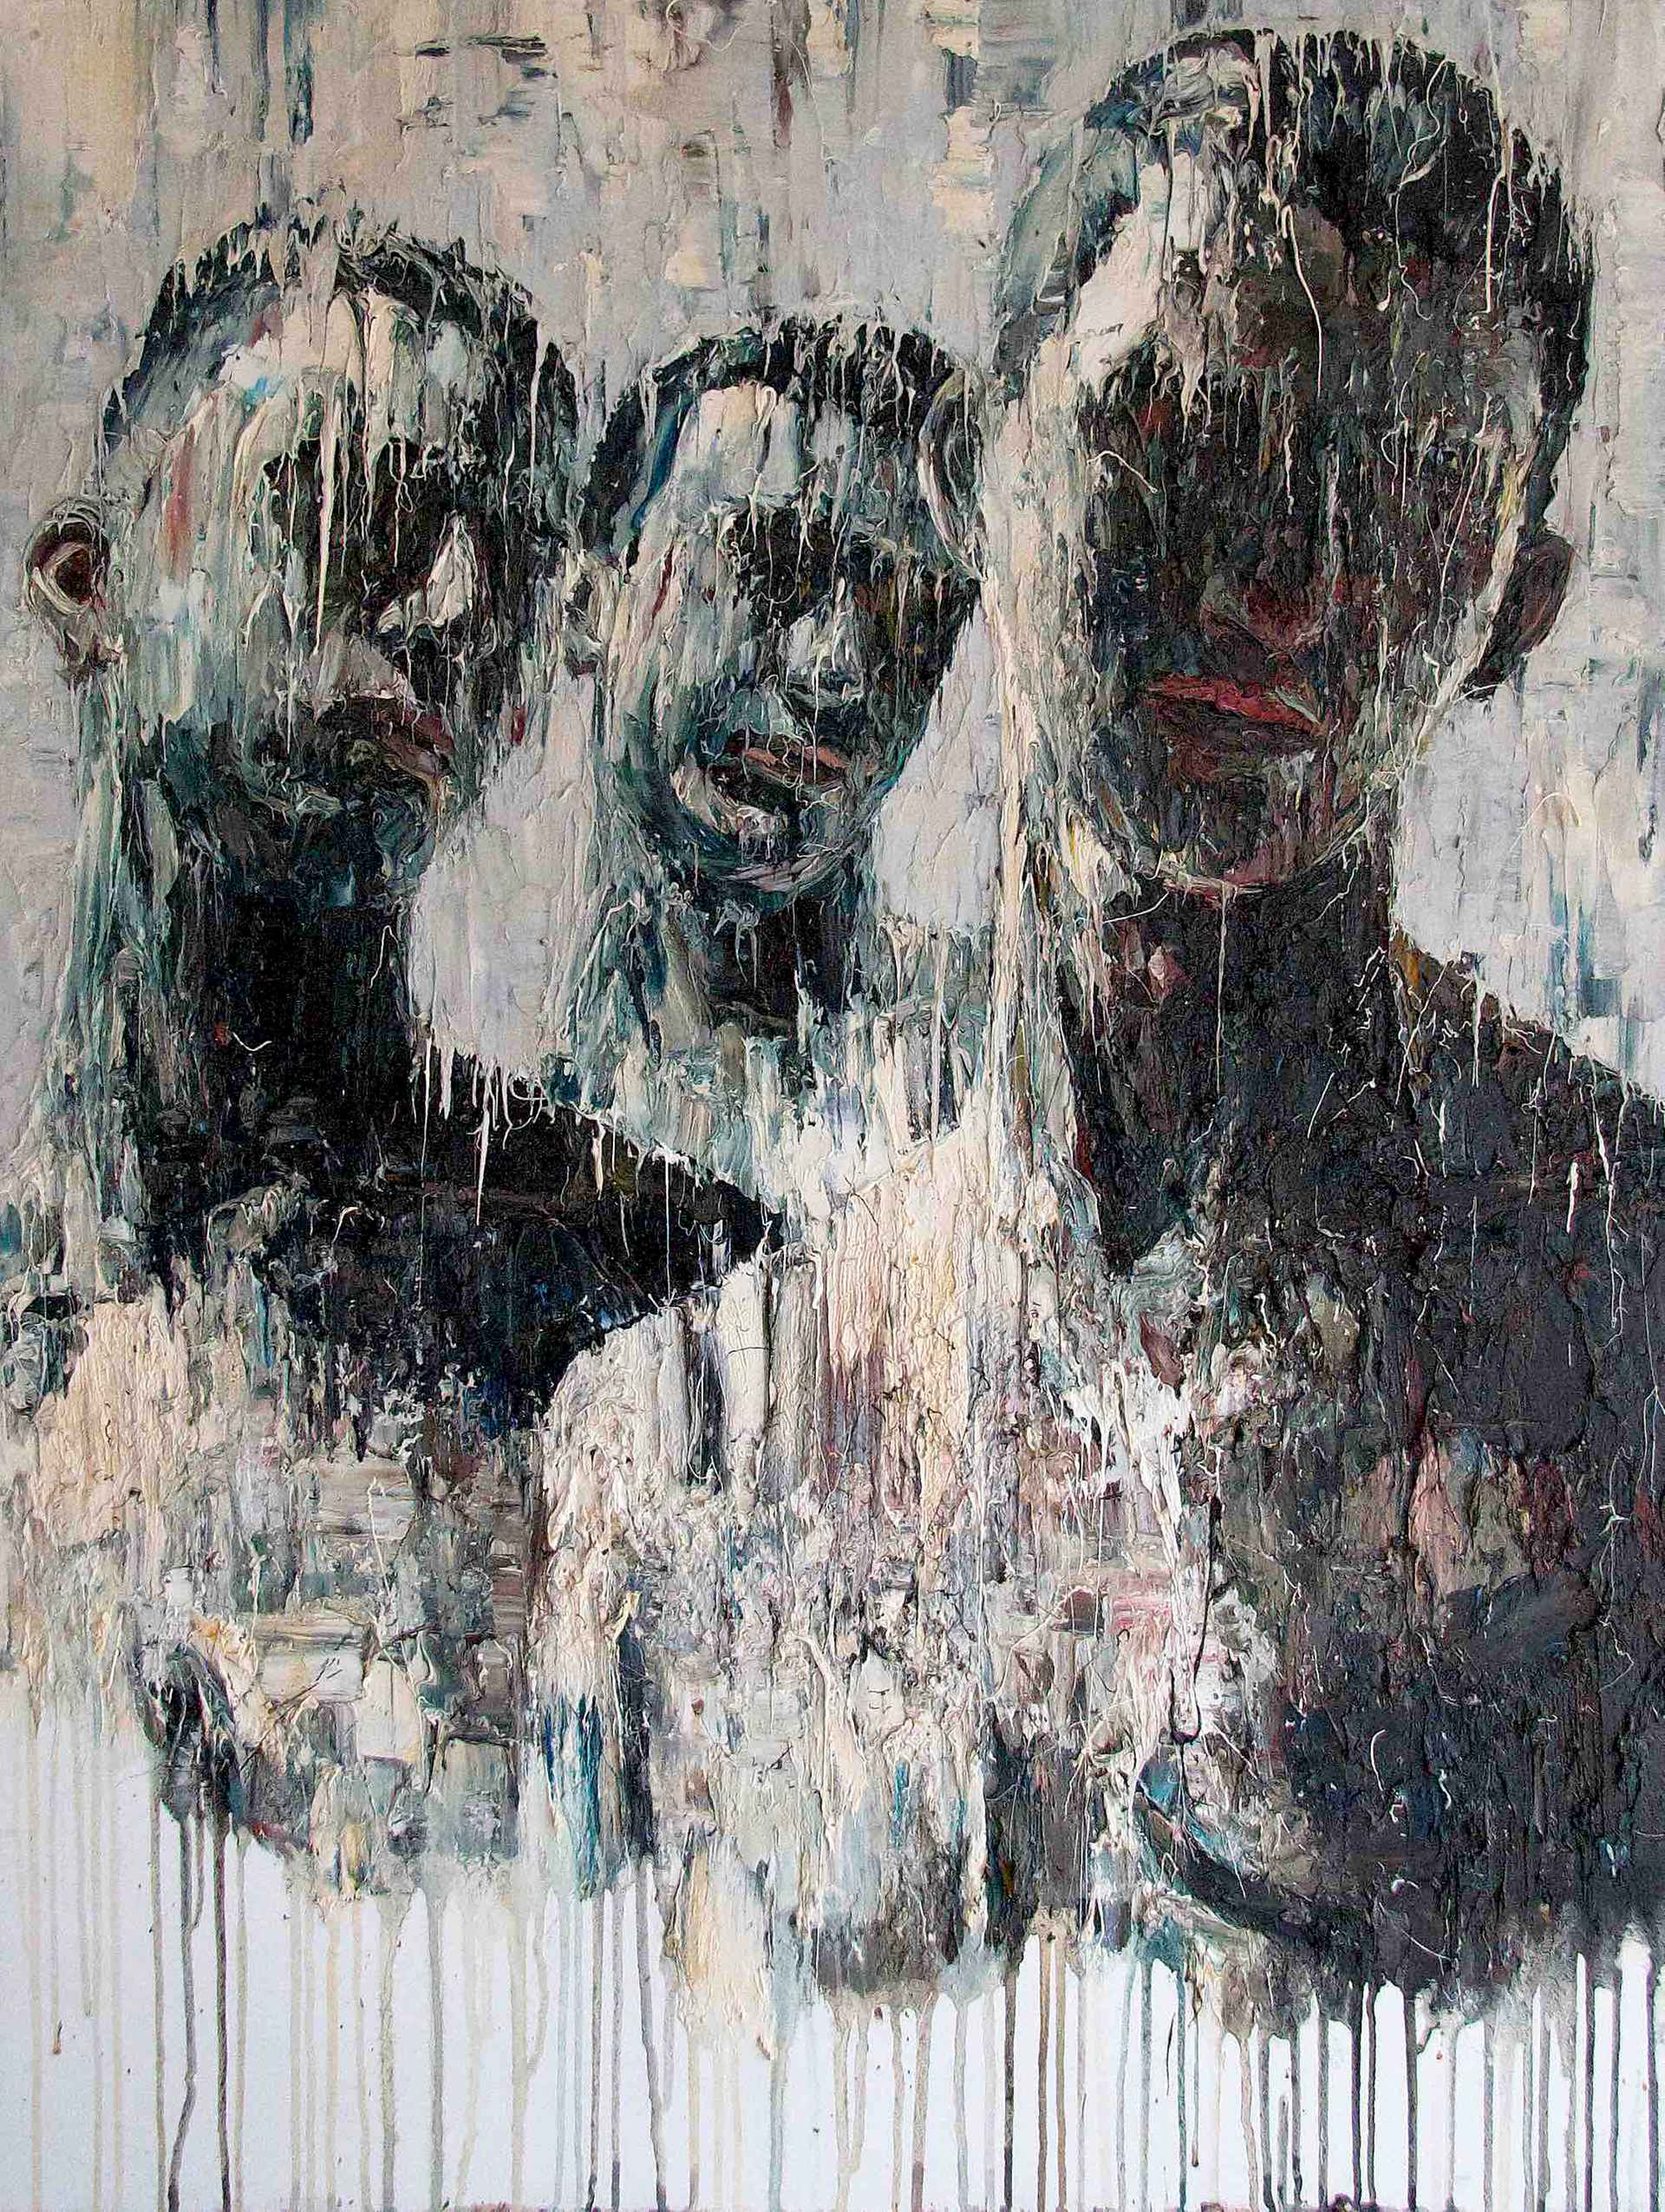 Bali Trio by Carl Melegari